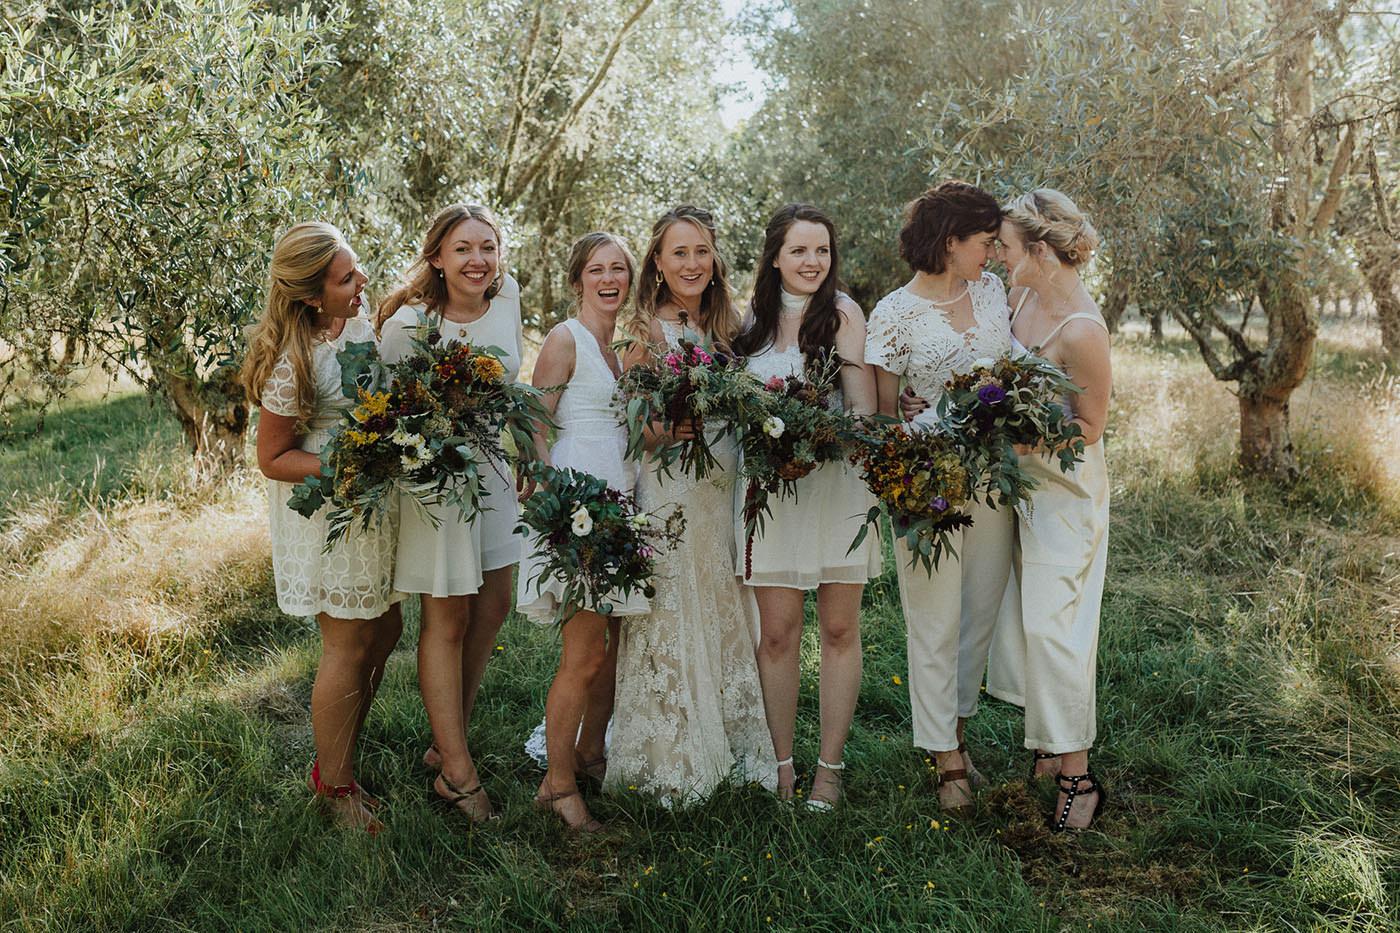 wedding_photographer_nz-00100.jpg